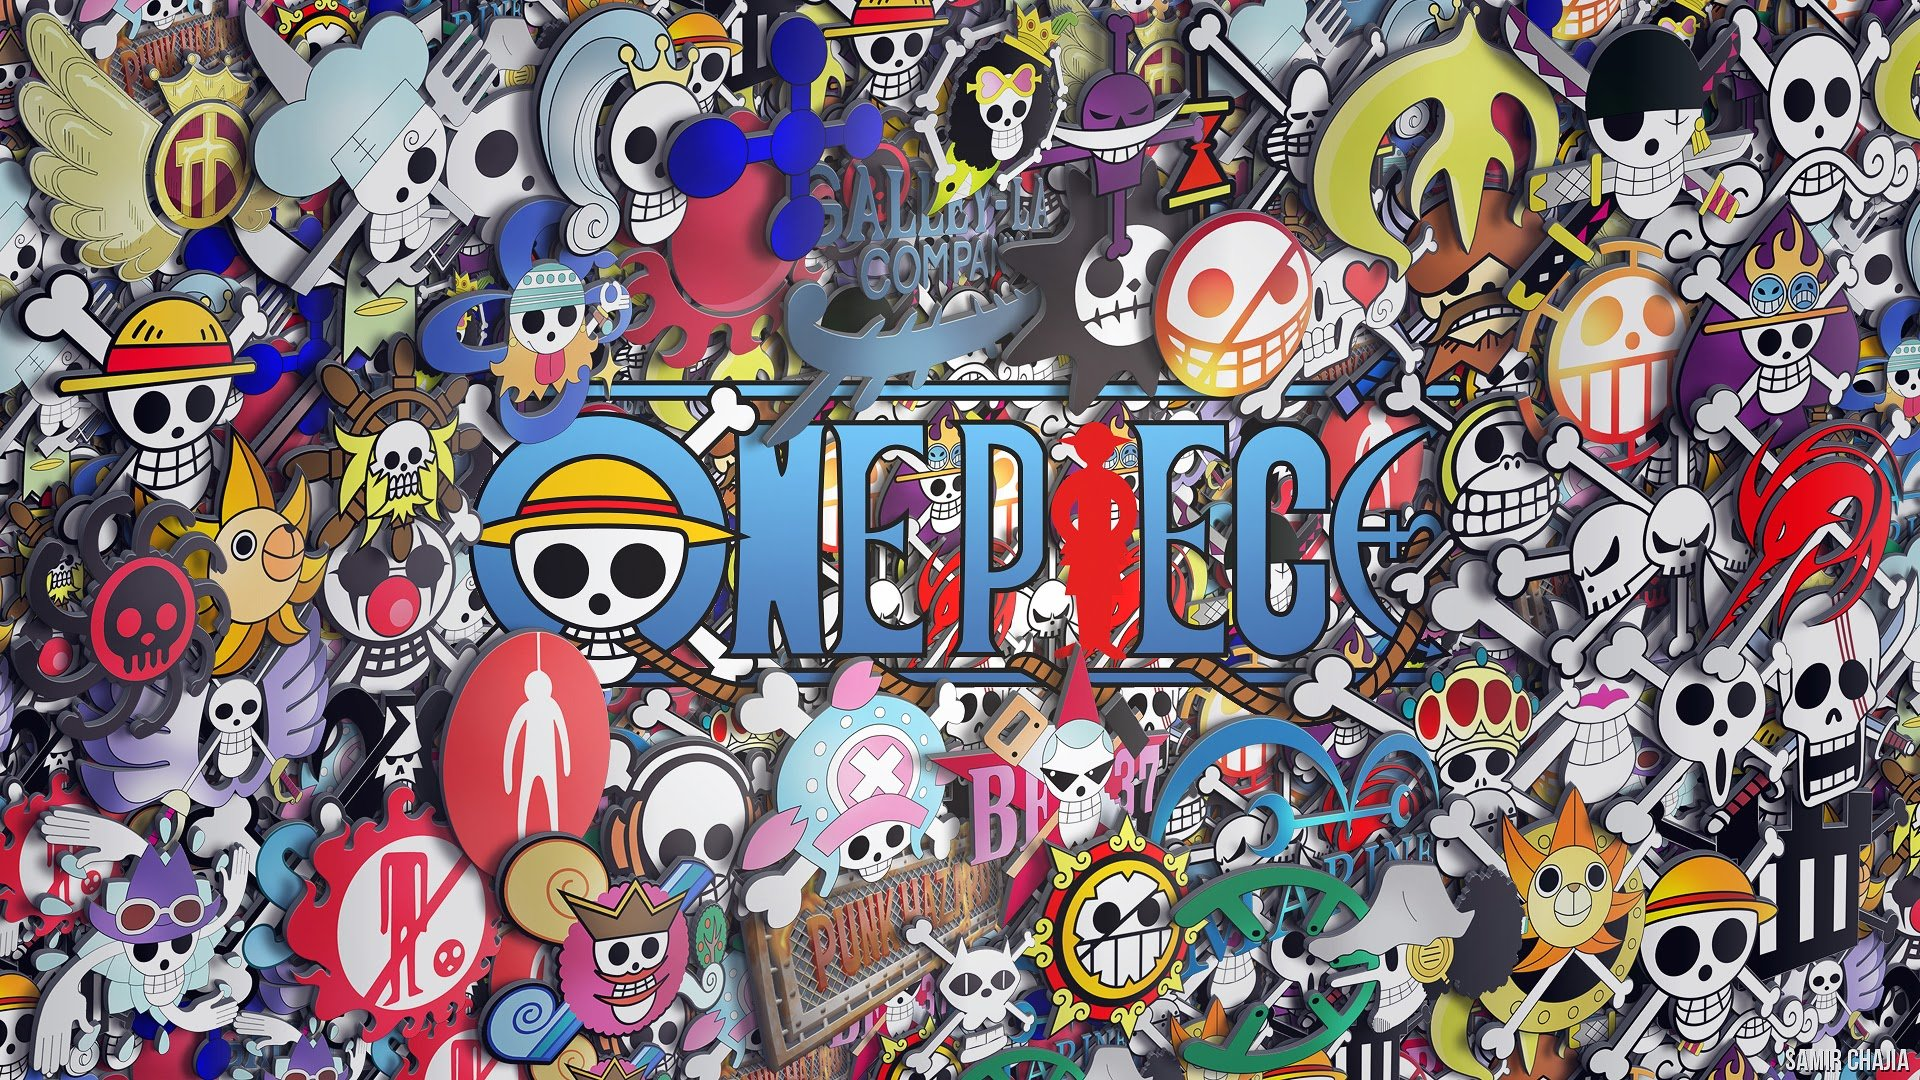 76 One Piece Wallpaper Hd On Wallpapersafari